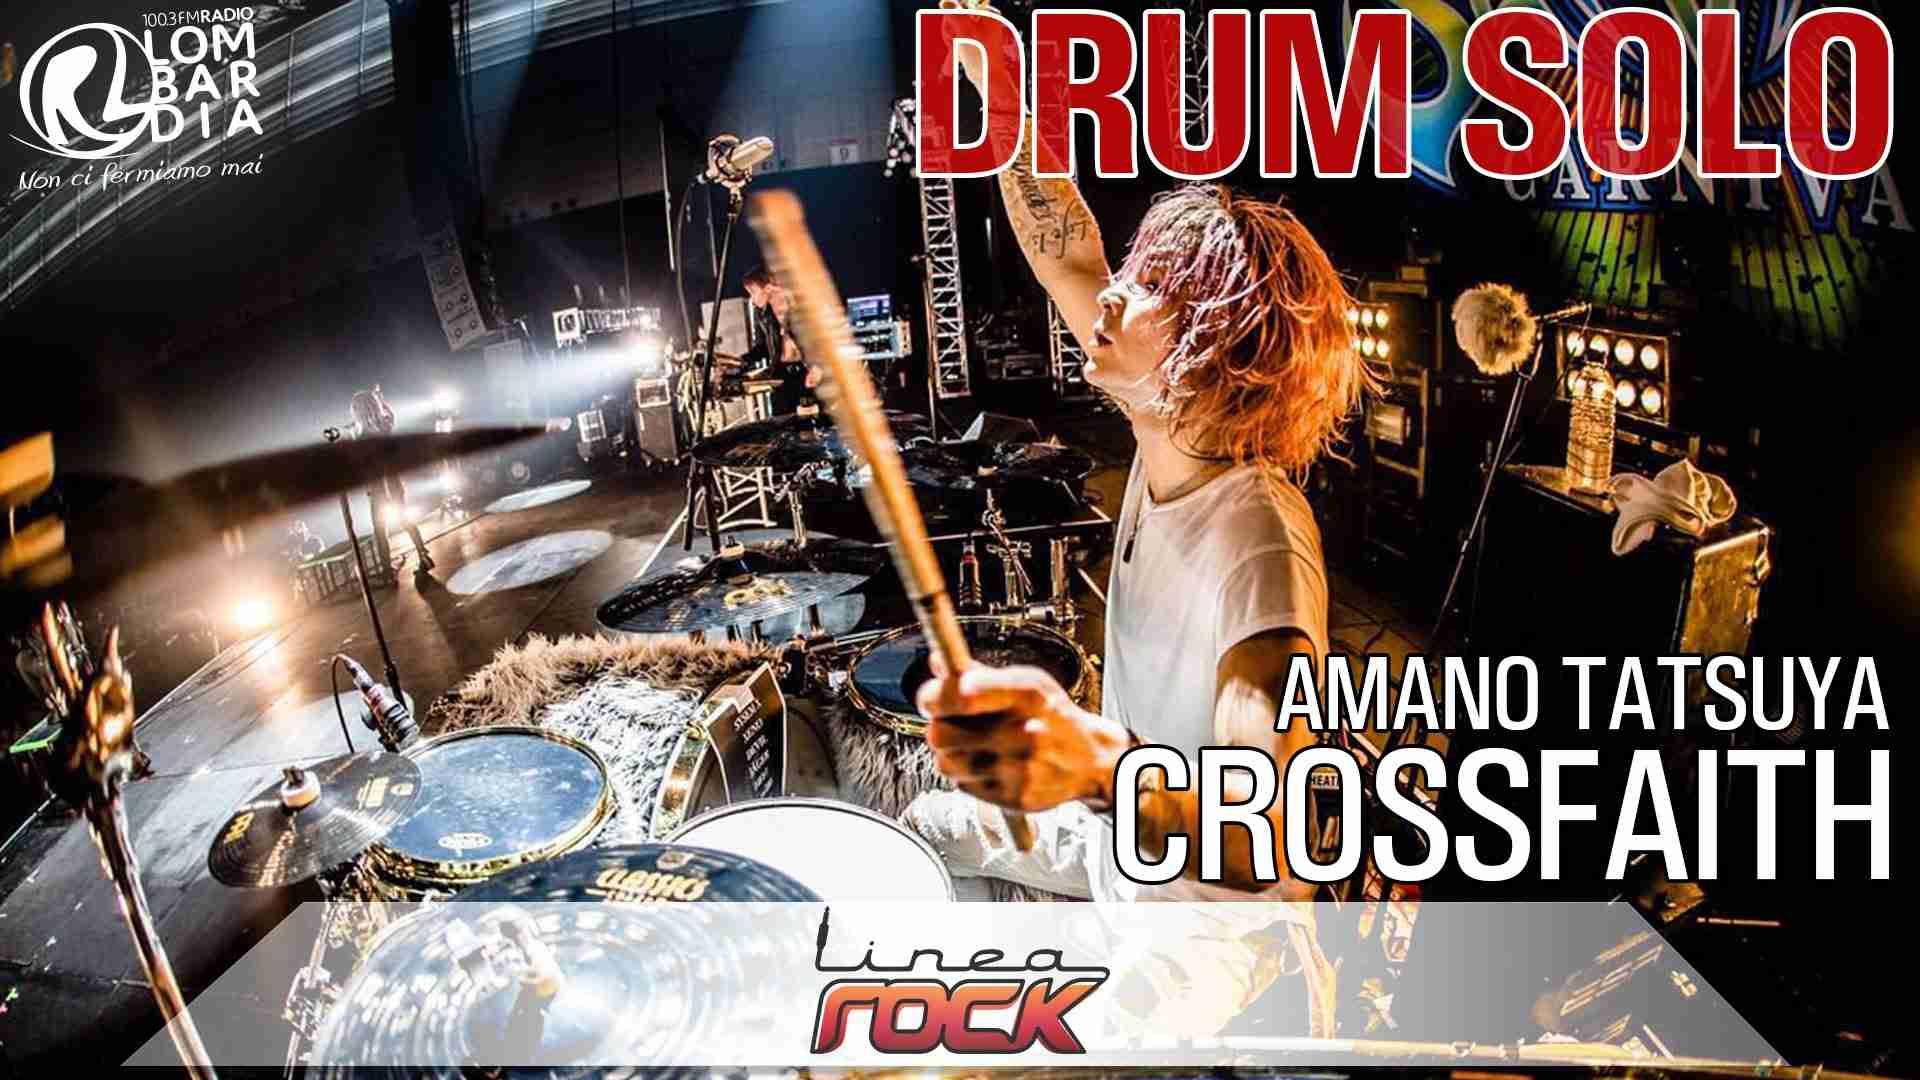 CROSSFAITH - Amano Tatsuya - drum solo live @Officina degli Angeli Verona - YouTube